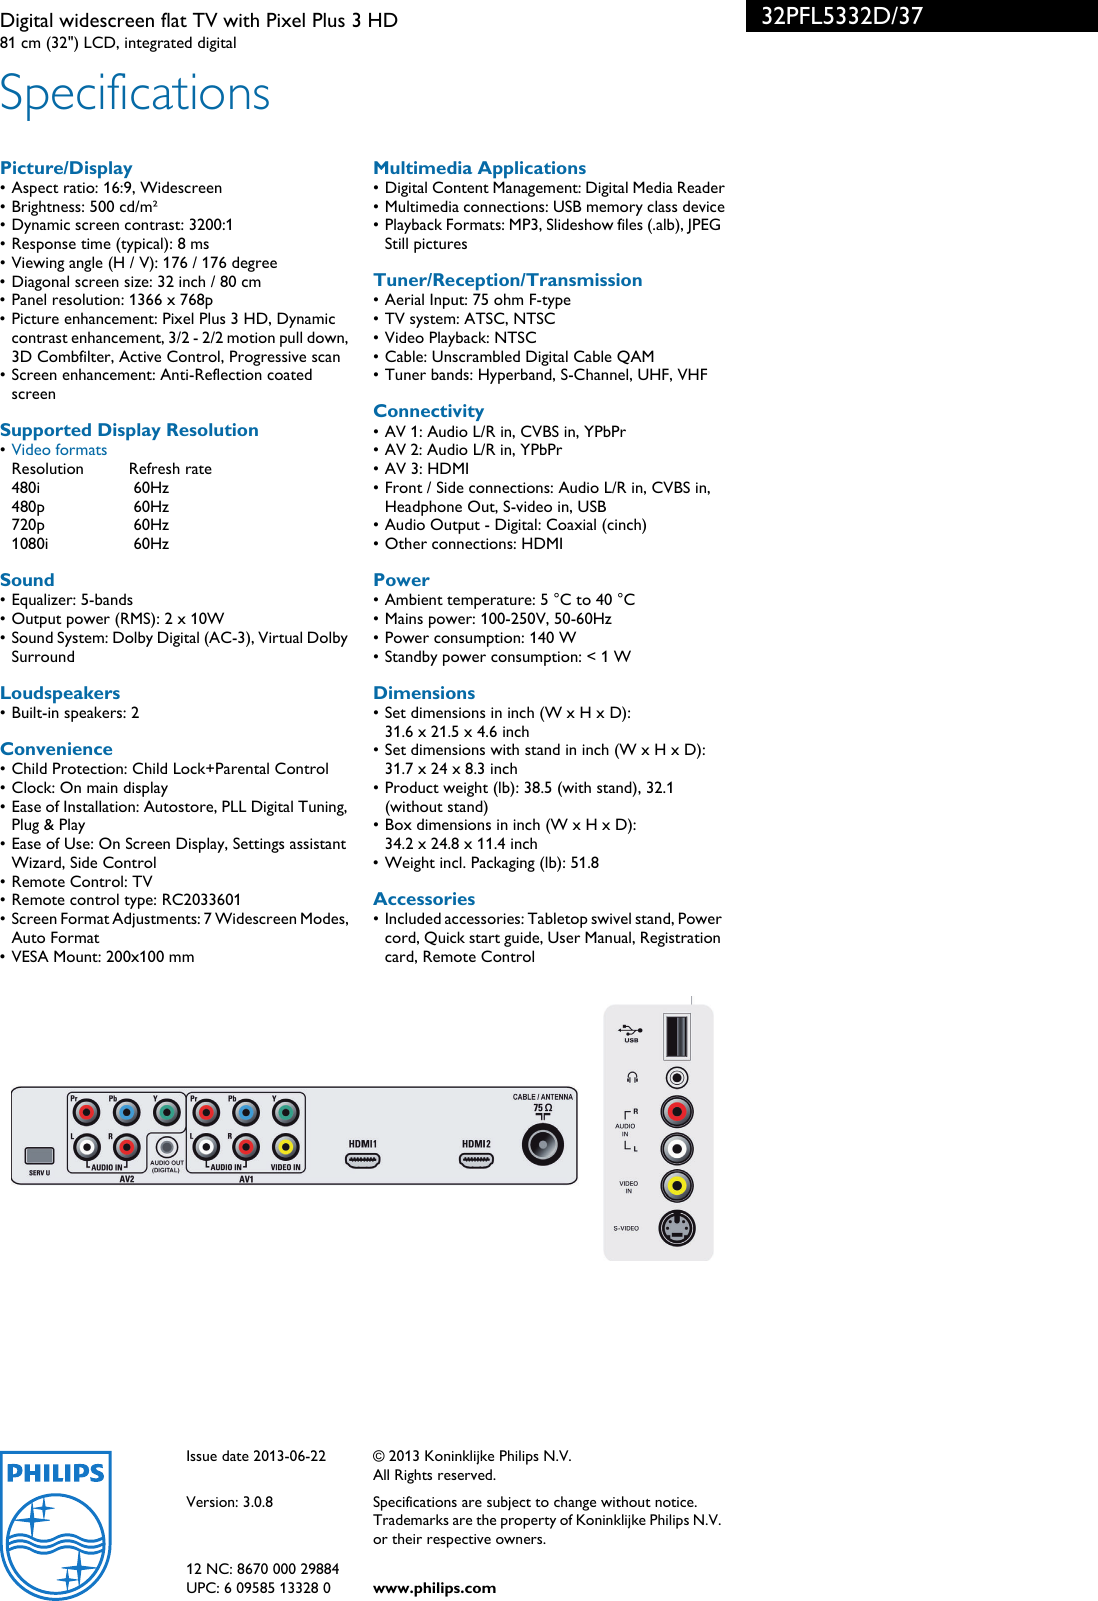 philips 32pfl5332d 37 digital widescreen flat tv with pixel plus 3 rh usermanual wiki TV Manual Packet Samsung Rear Projection TV Manual